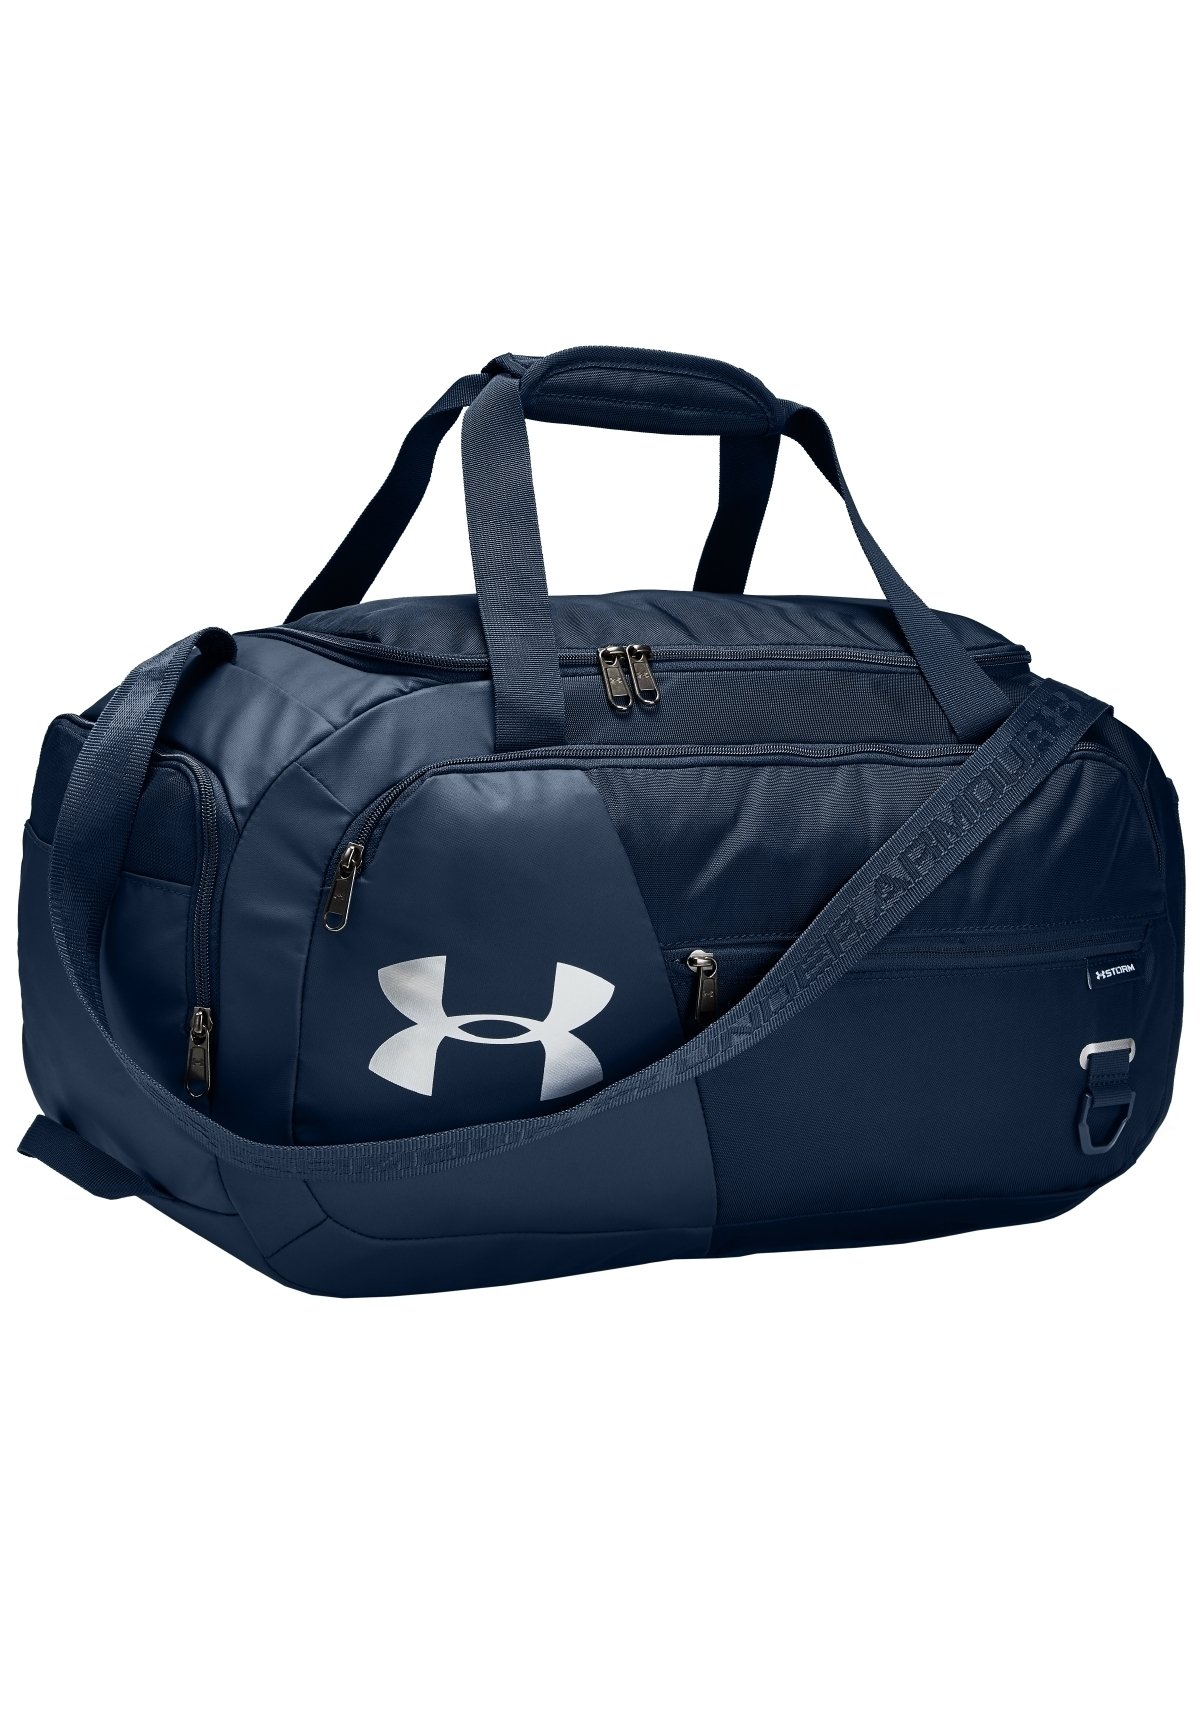 Women UNDENIABLE UNISEX - Sports bag - academy-academy-black